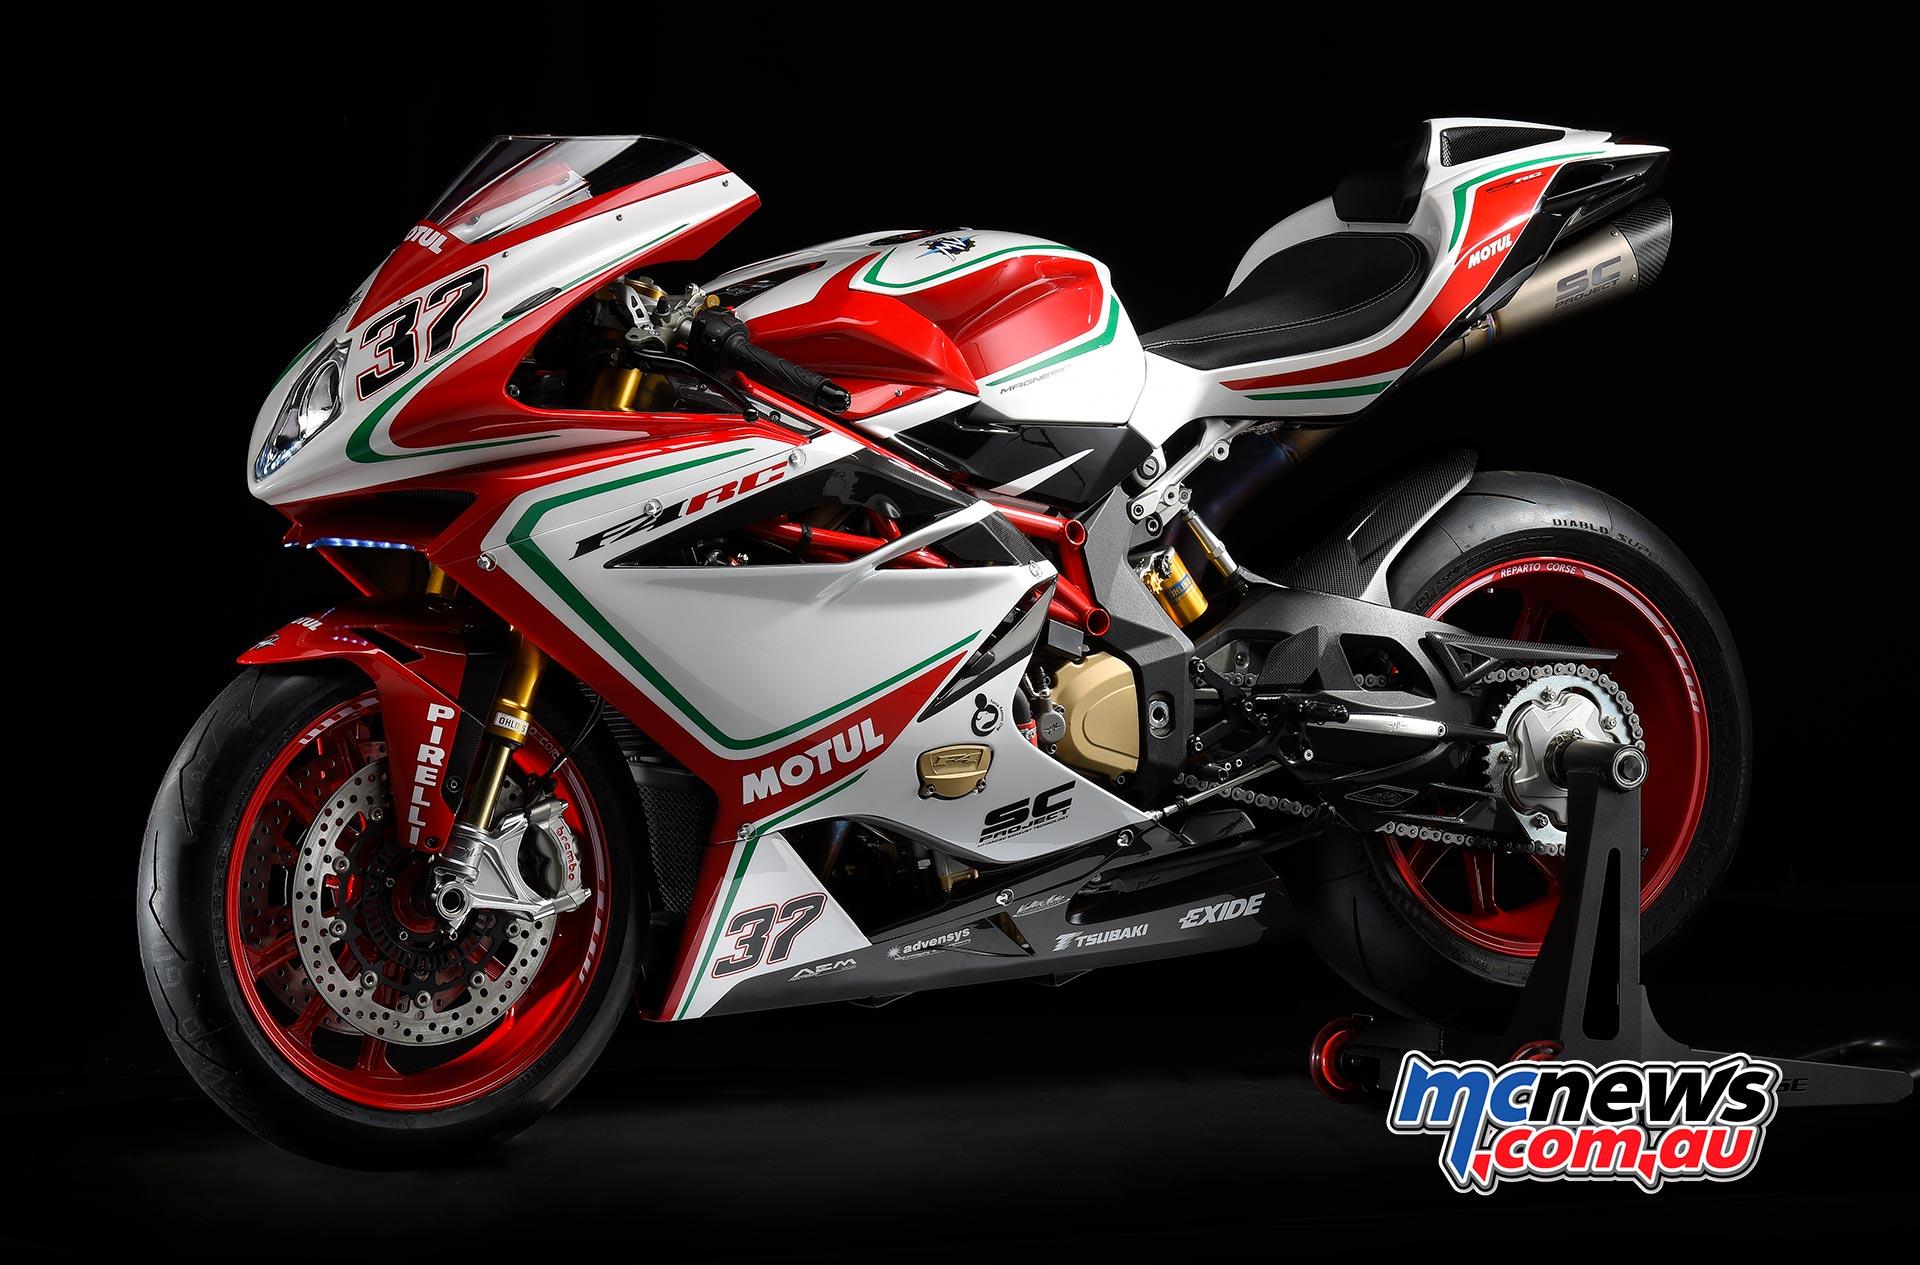 mv agusta  New MV Agusta F4 RC Limited Edition | 212hp | MCNews.